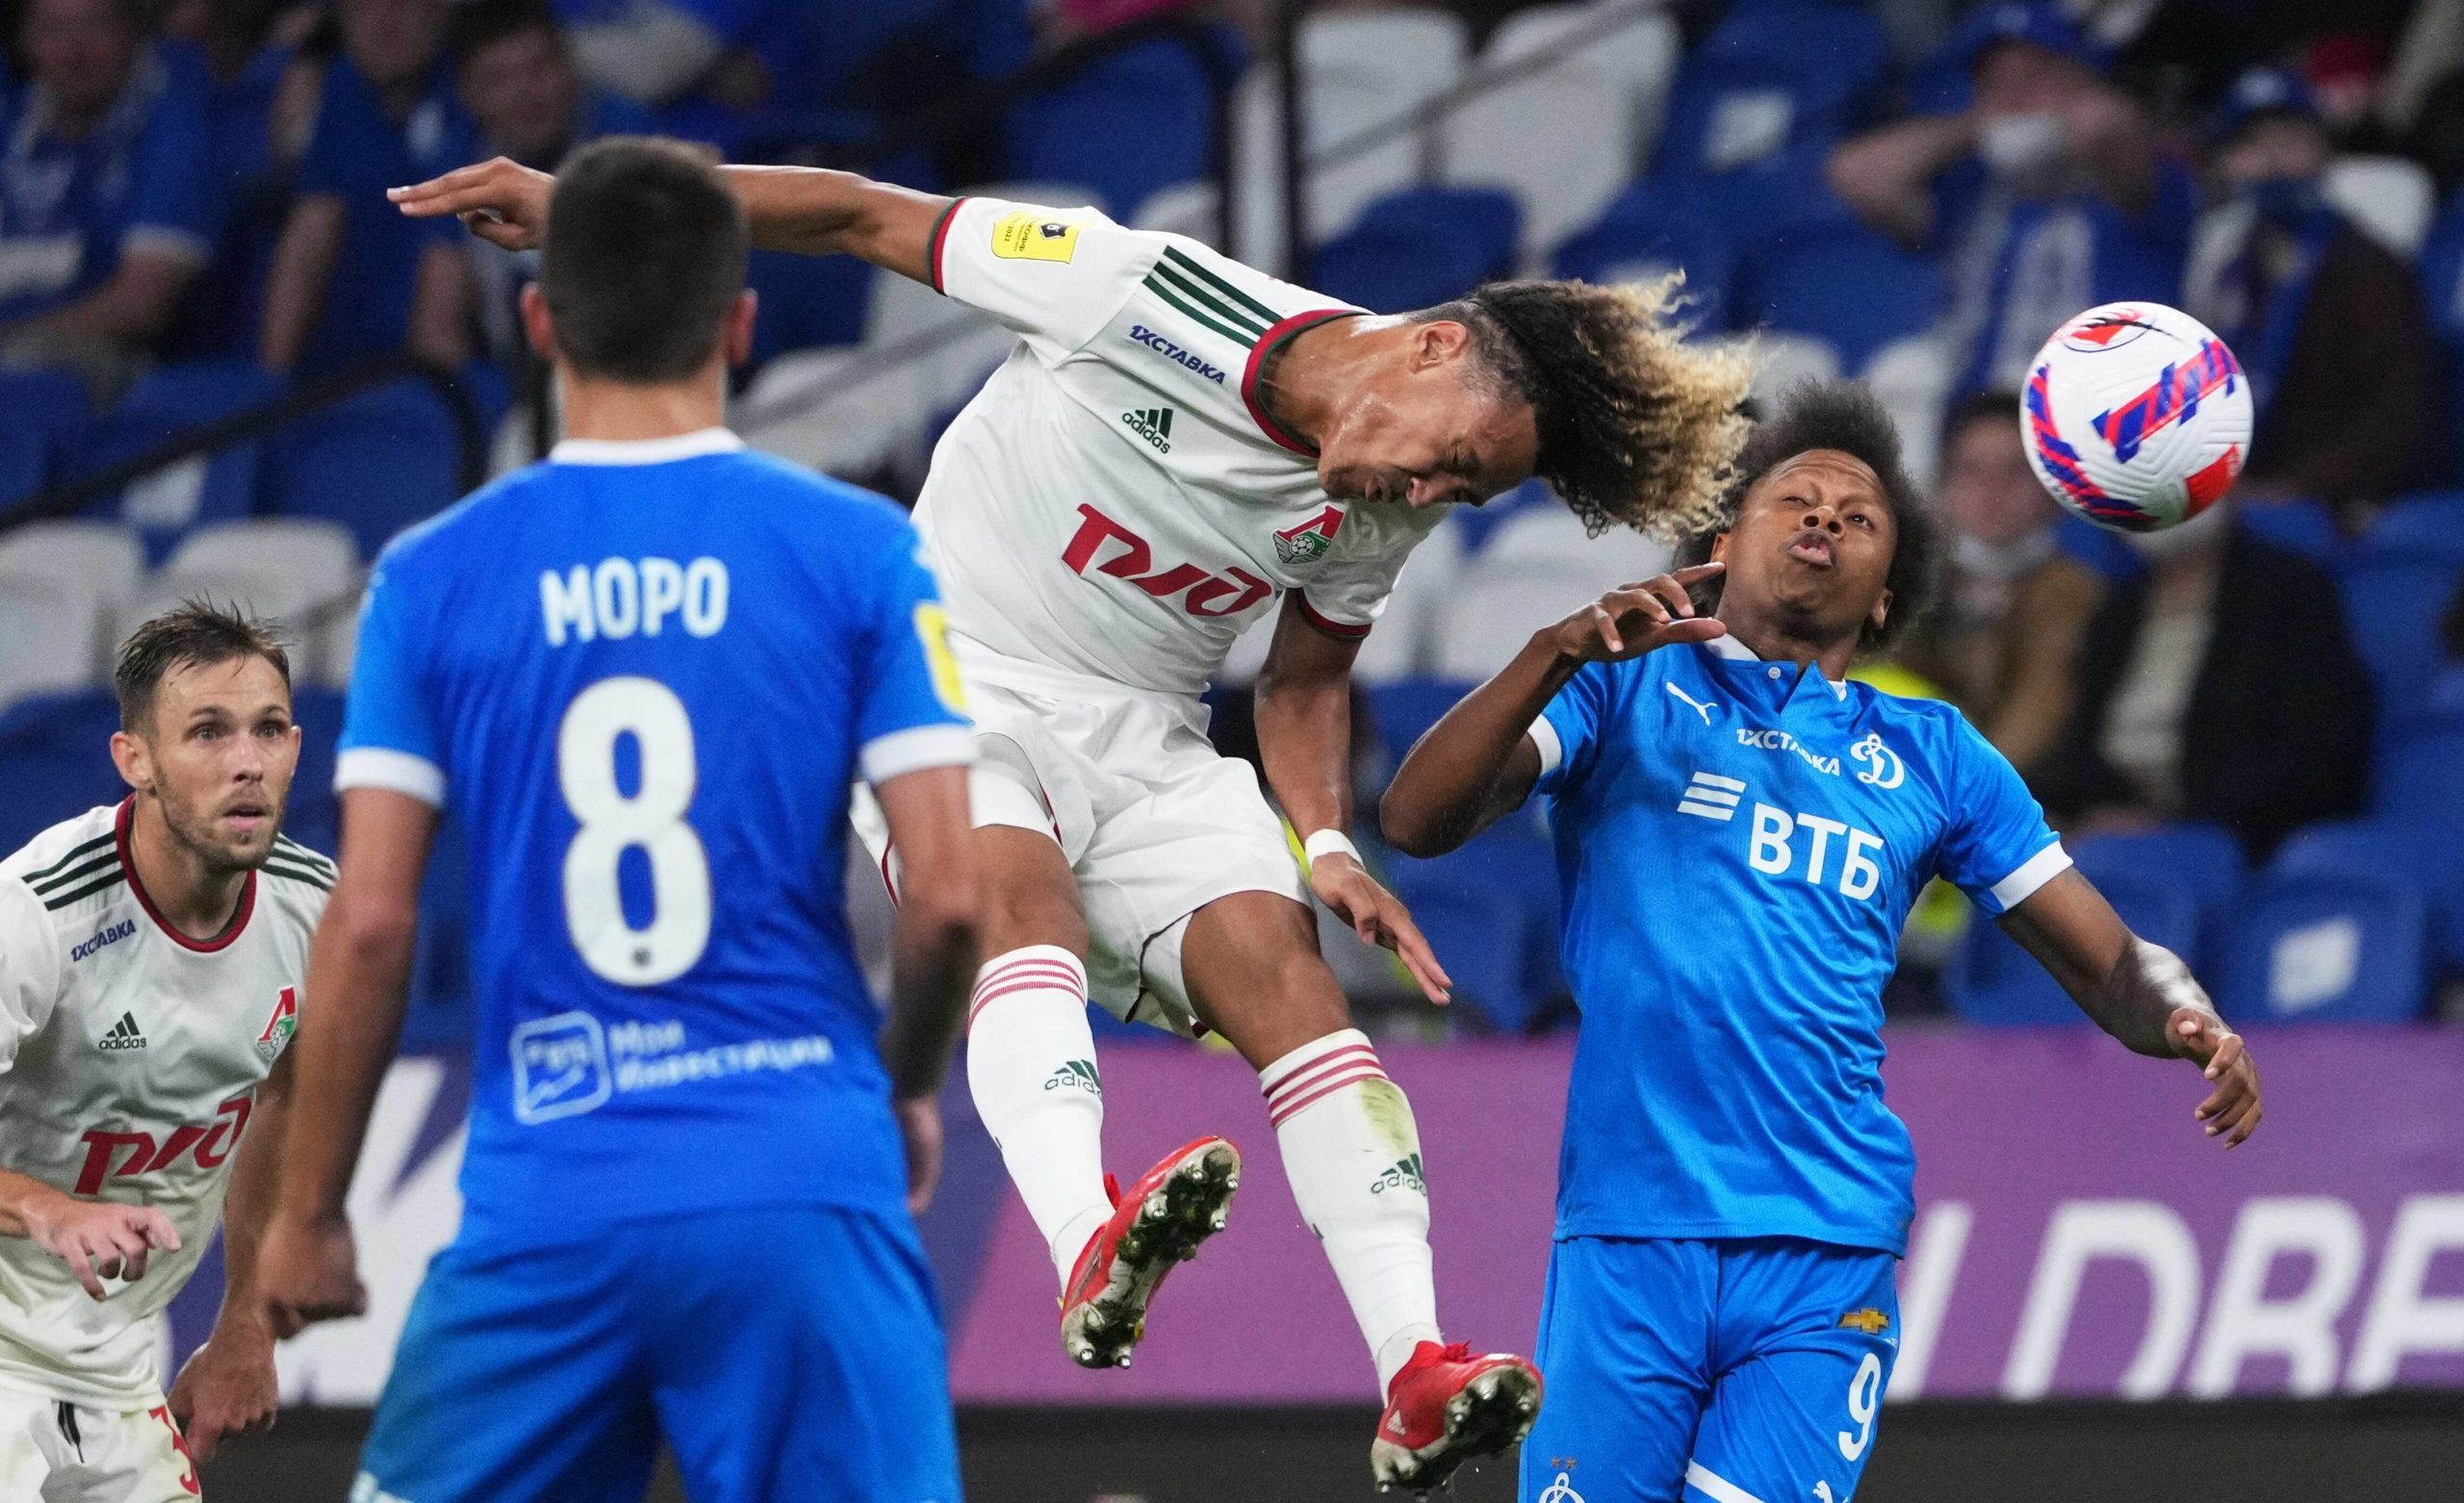 [Photos] Les premières minutes de Beka Beka avec le Lokomotiv Moscou